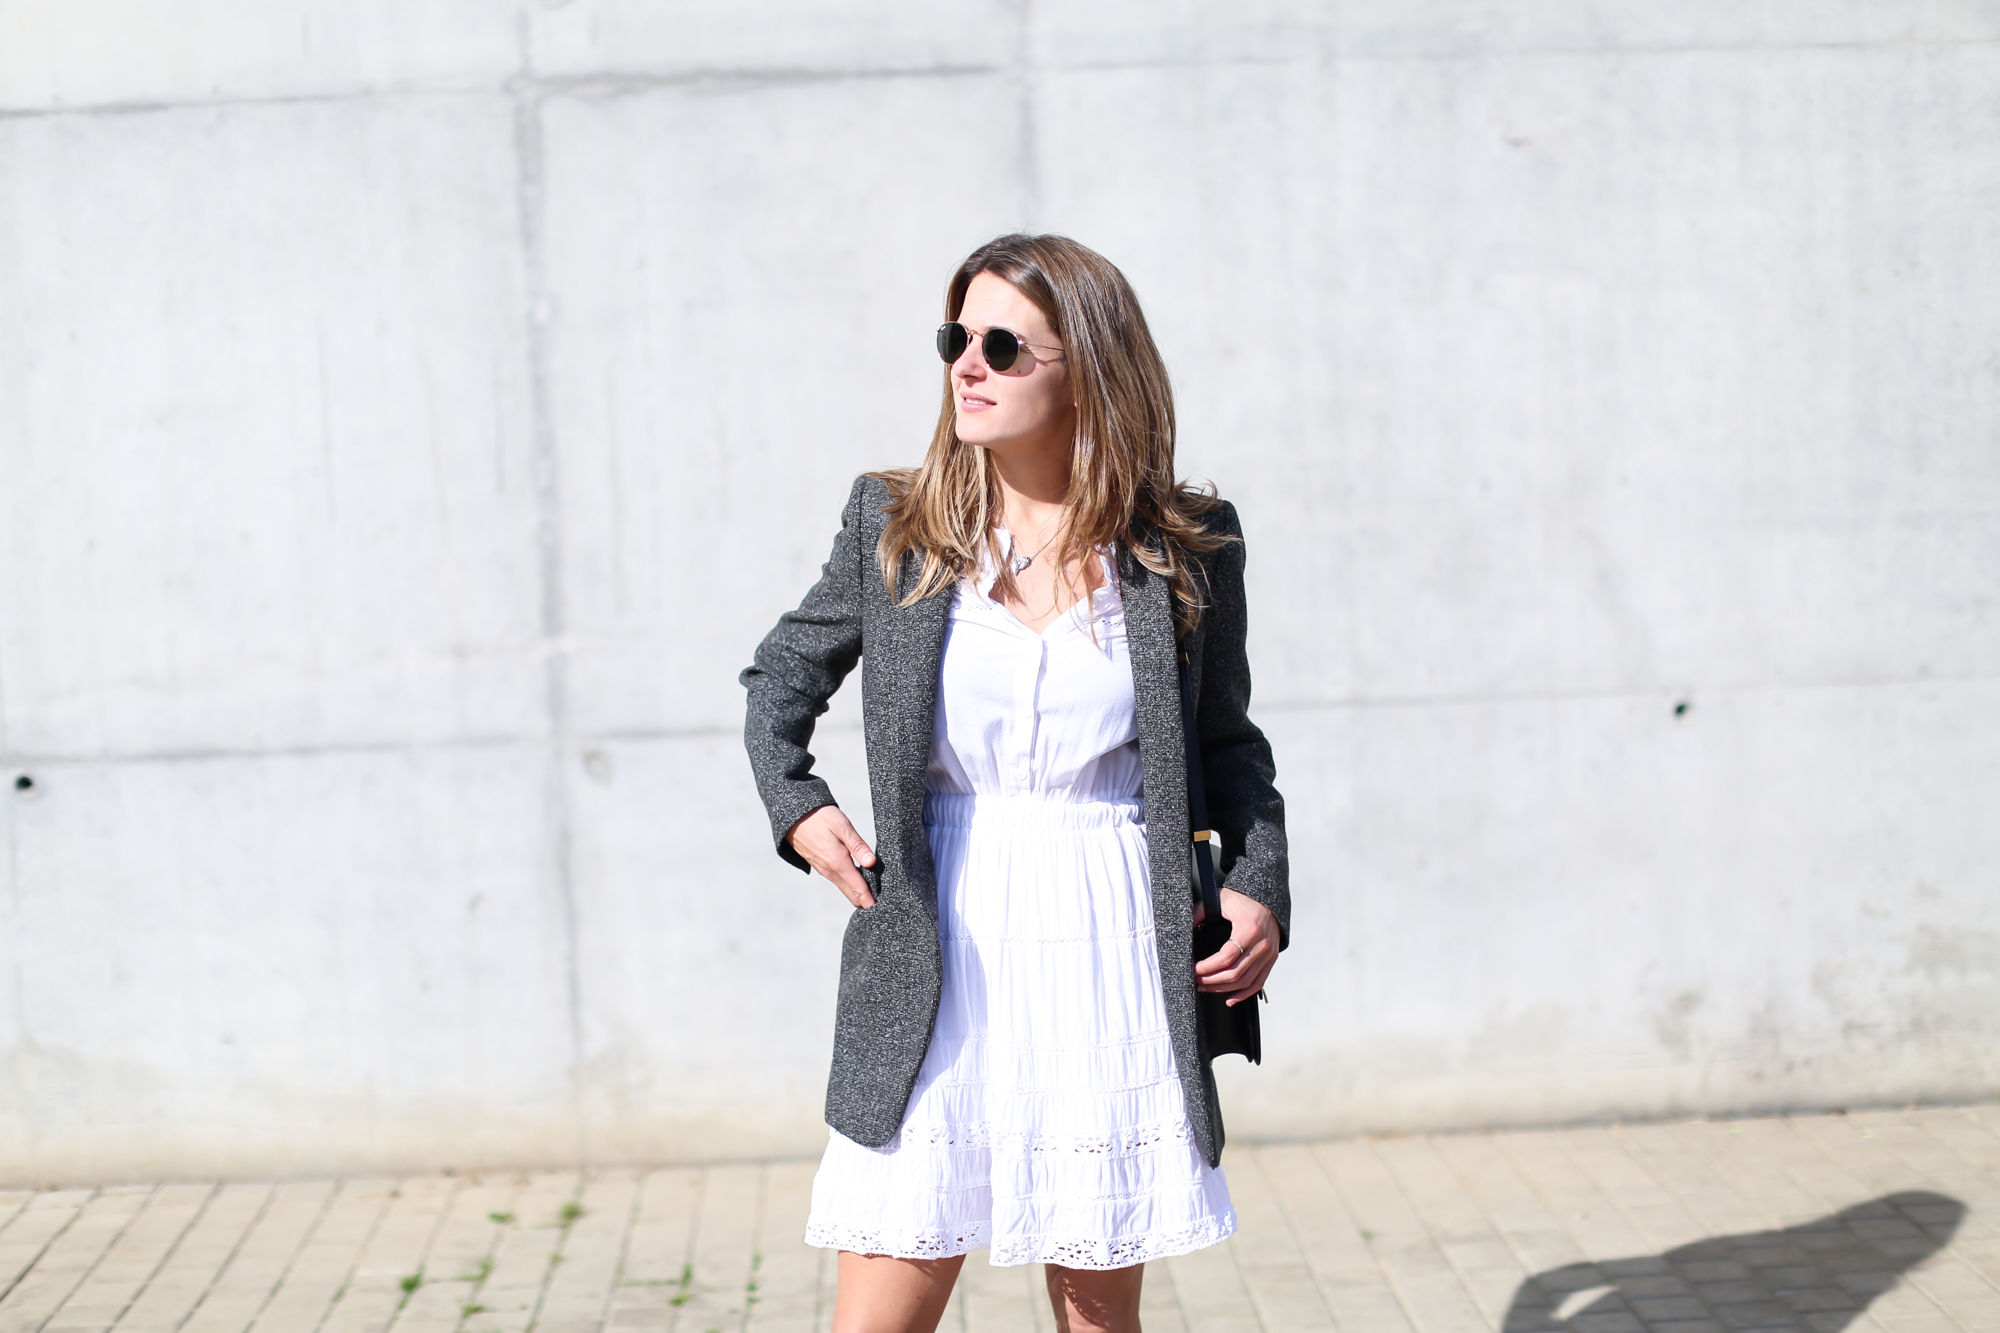 Clochet_streetstyle_fashionblogger_botinesdickerisabelmarant_celineboxbag-4